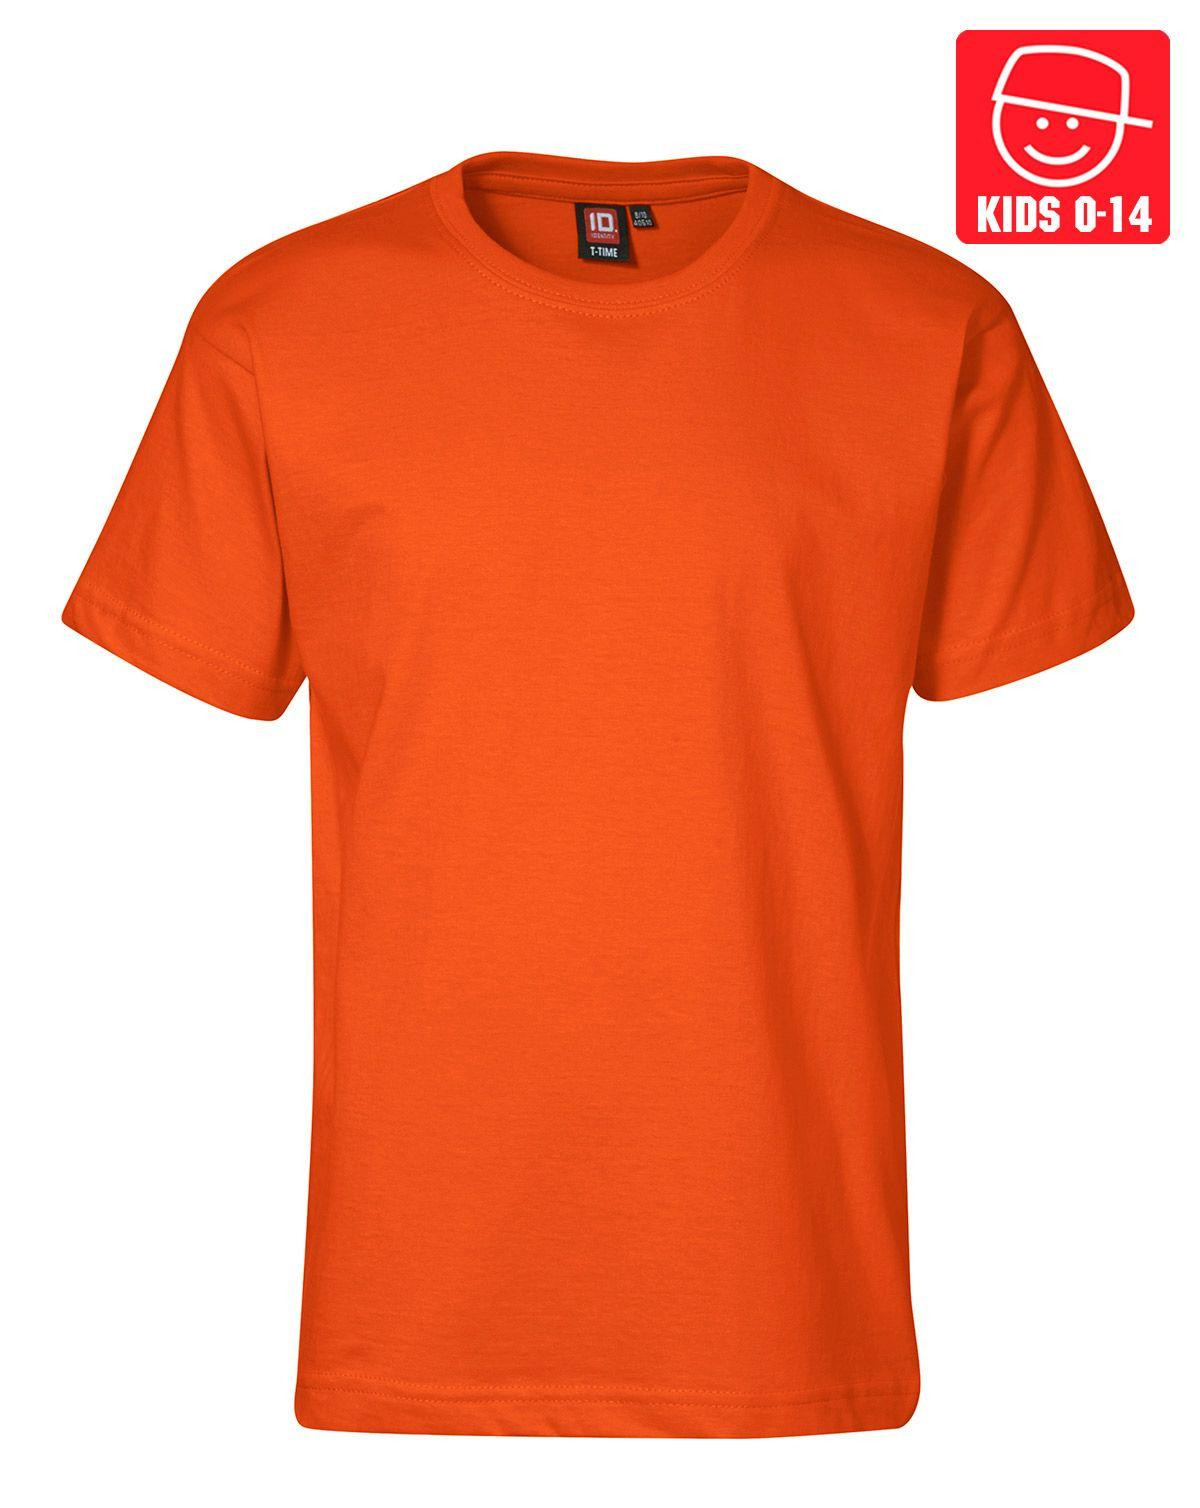 Image of   ID T-TIME T-shirt (Orange, 122)